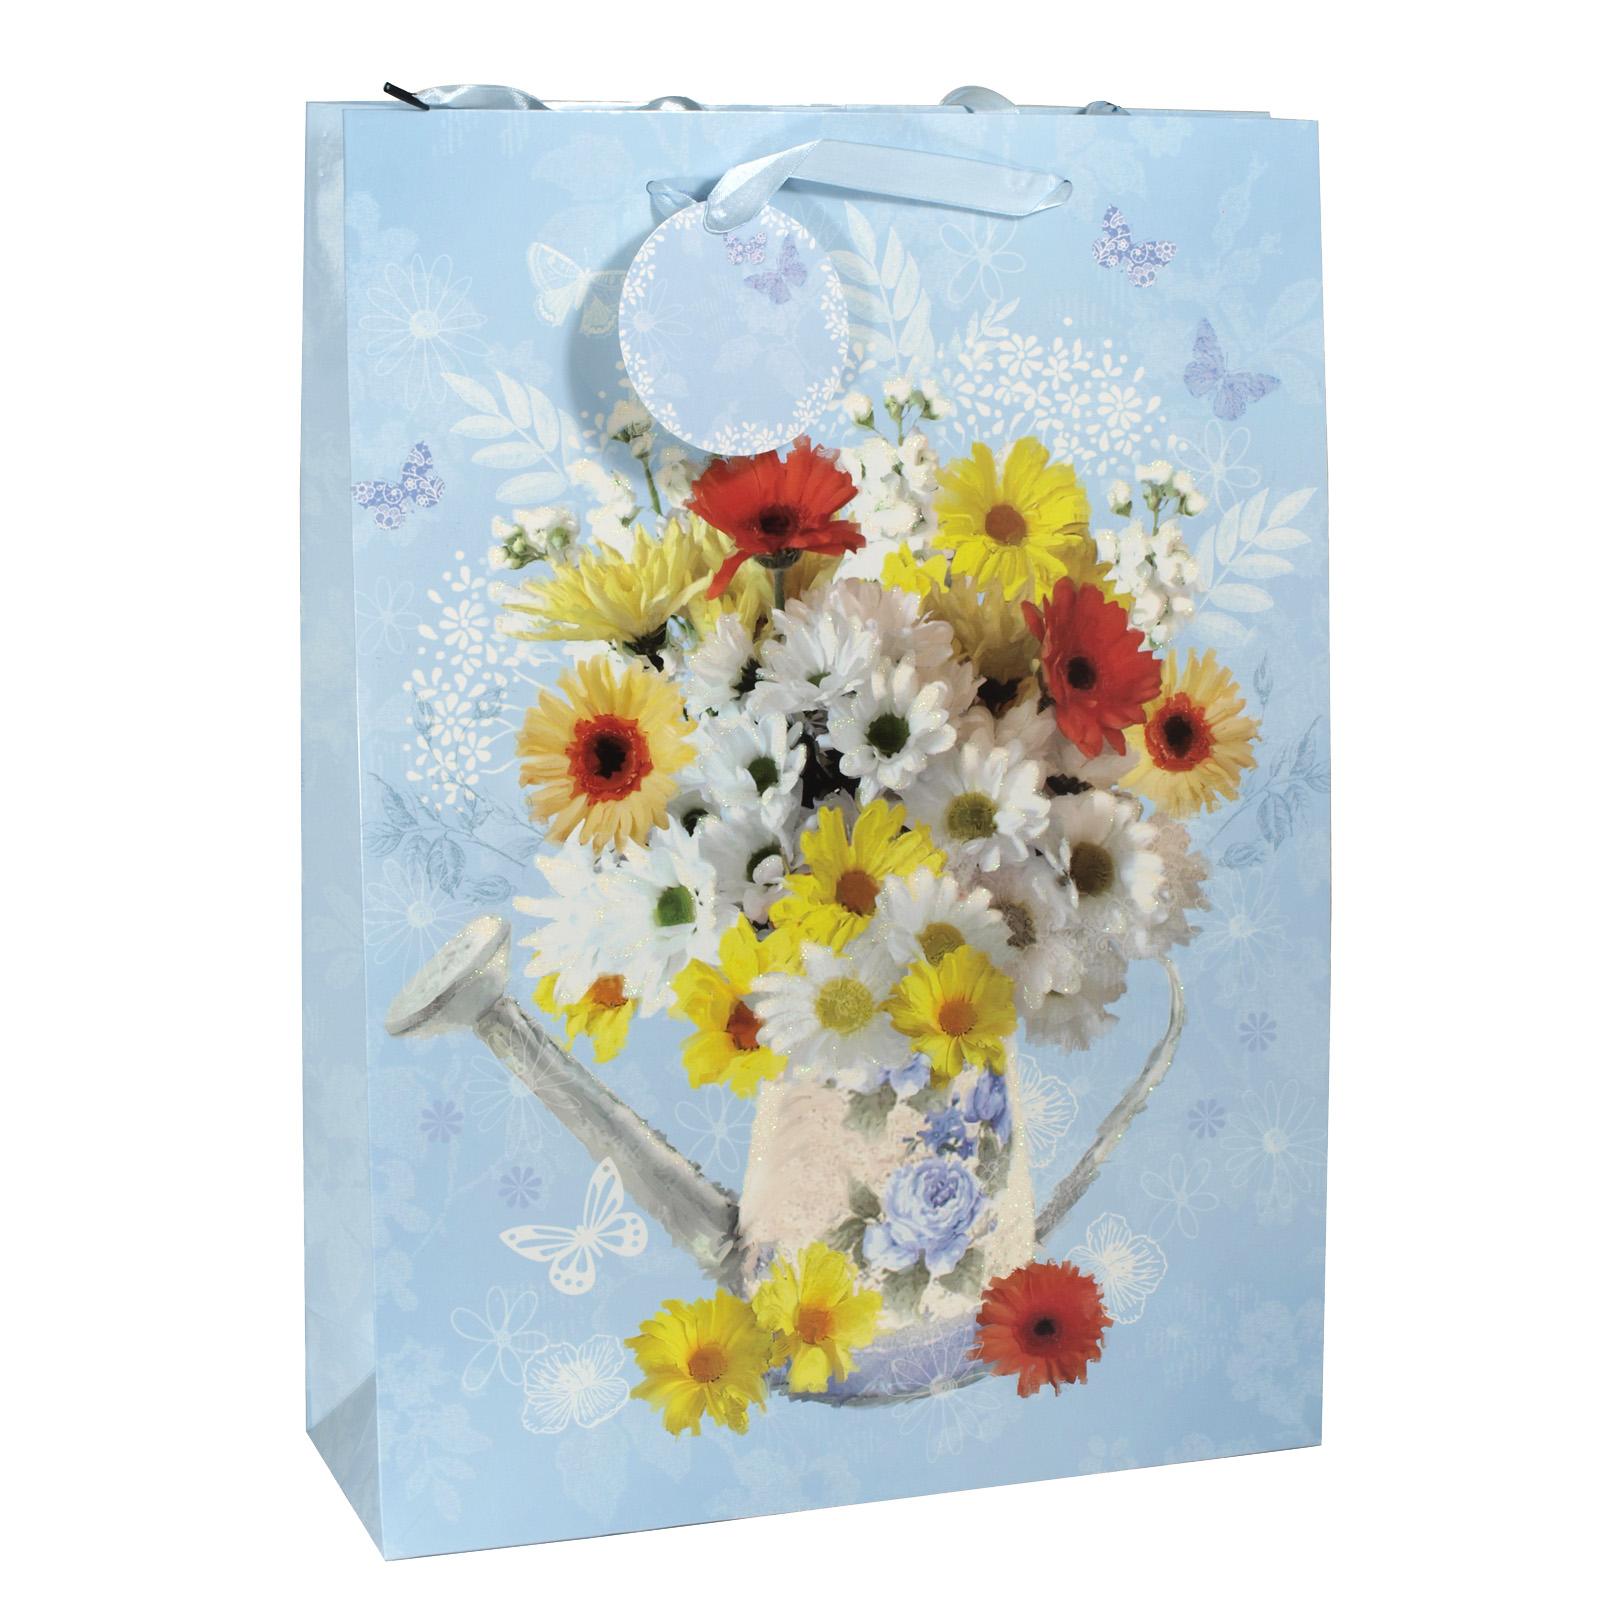 GIFT BAG EX LGE WATERCAN FLOWERS X6